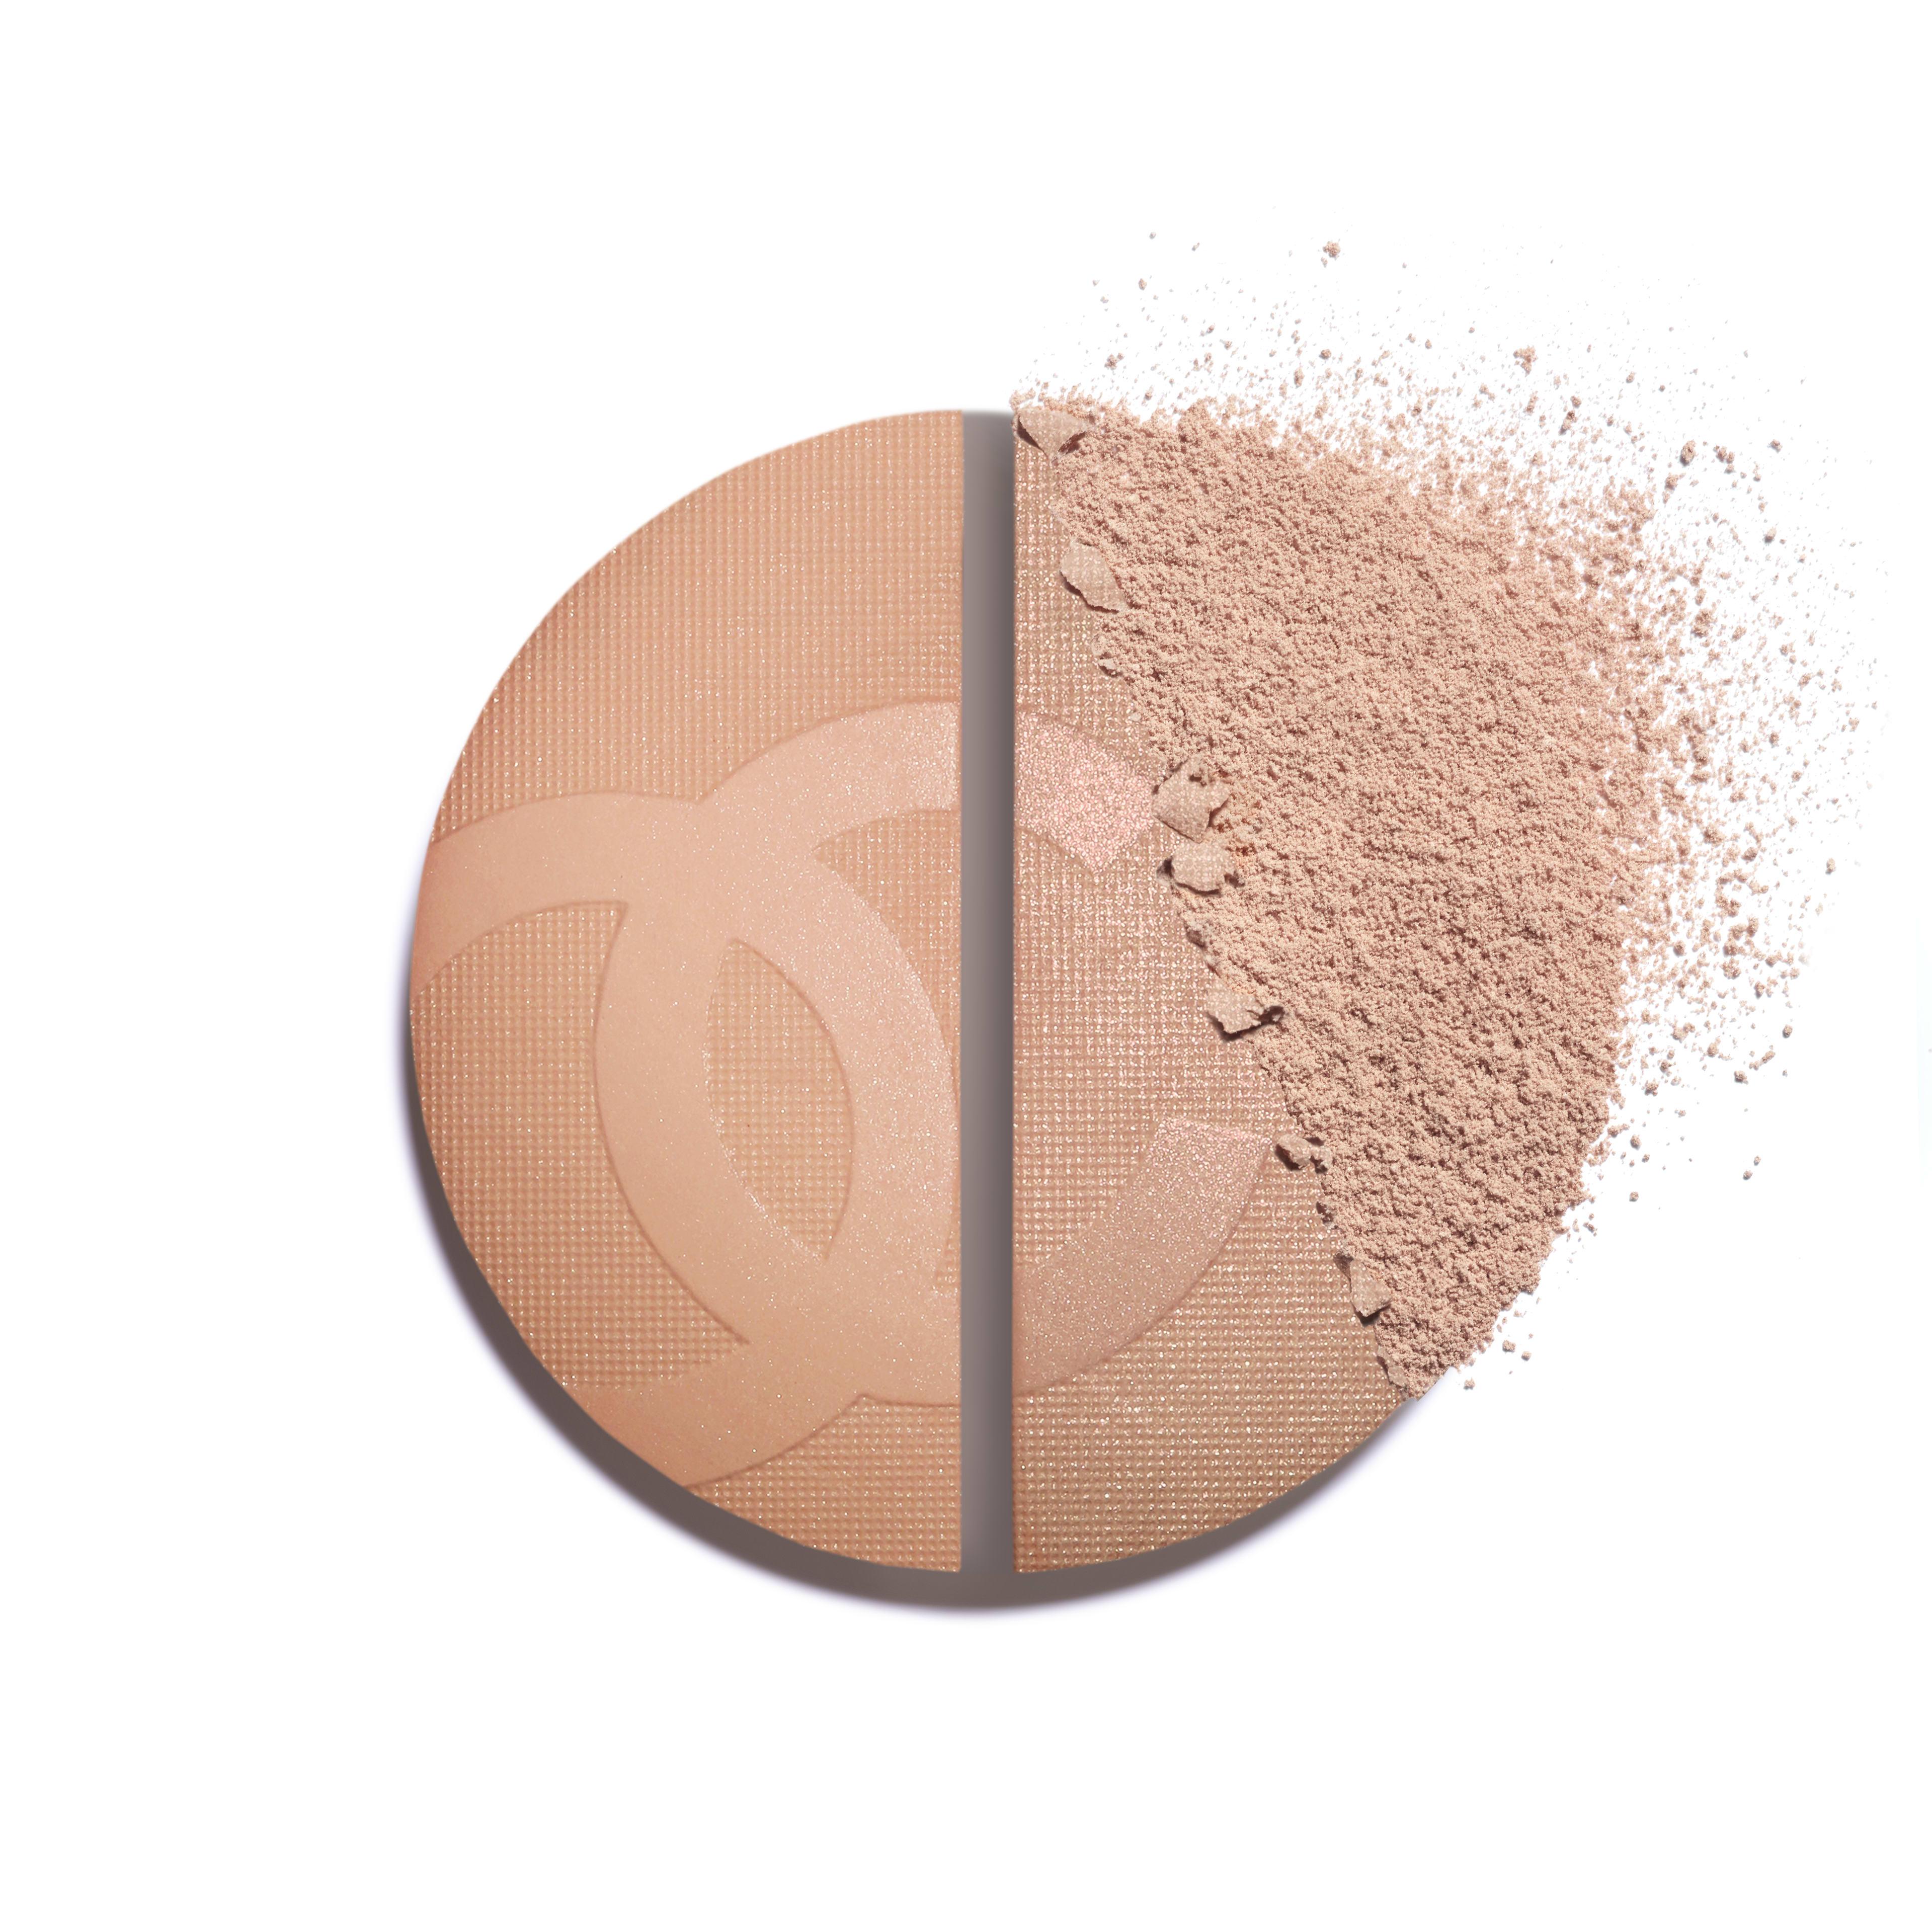 DUO BRONZE ET LUMIÈRE - makeup - 8g - Просмотр основной текстуры